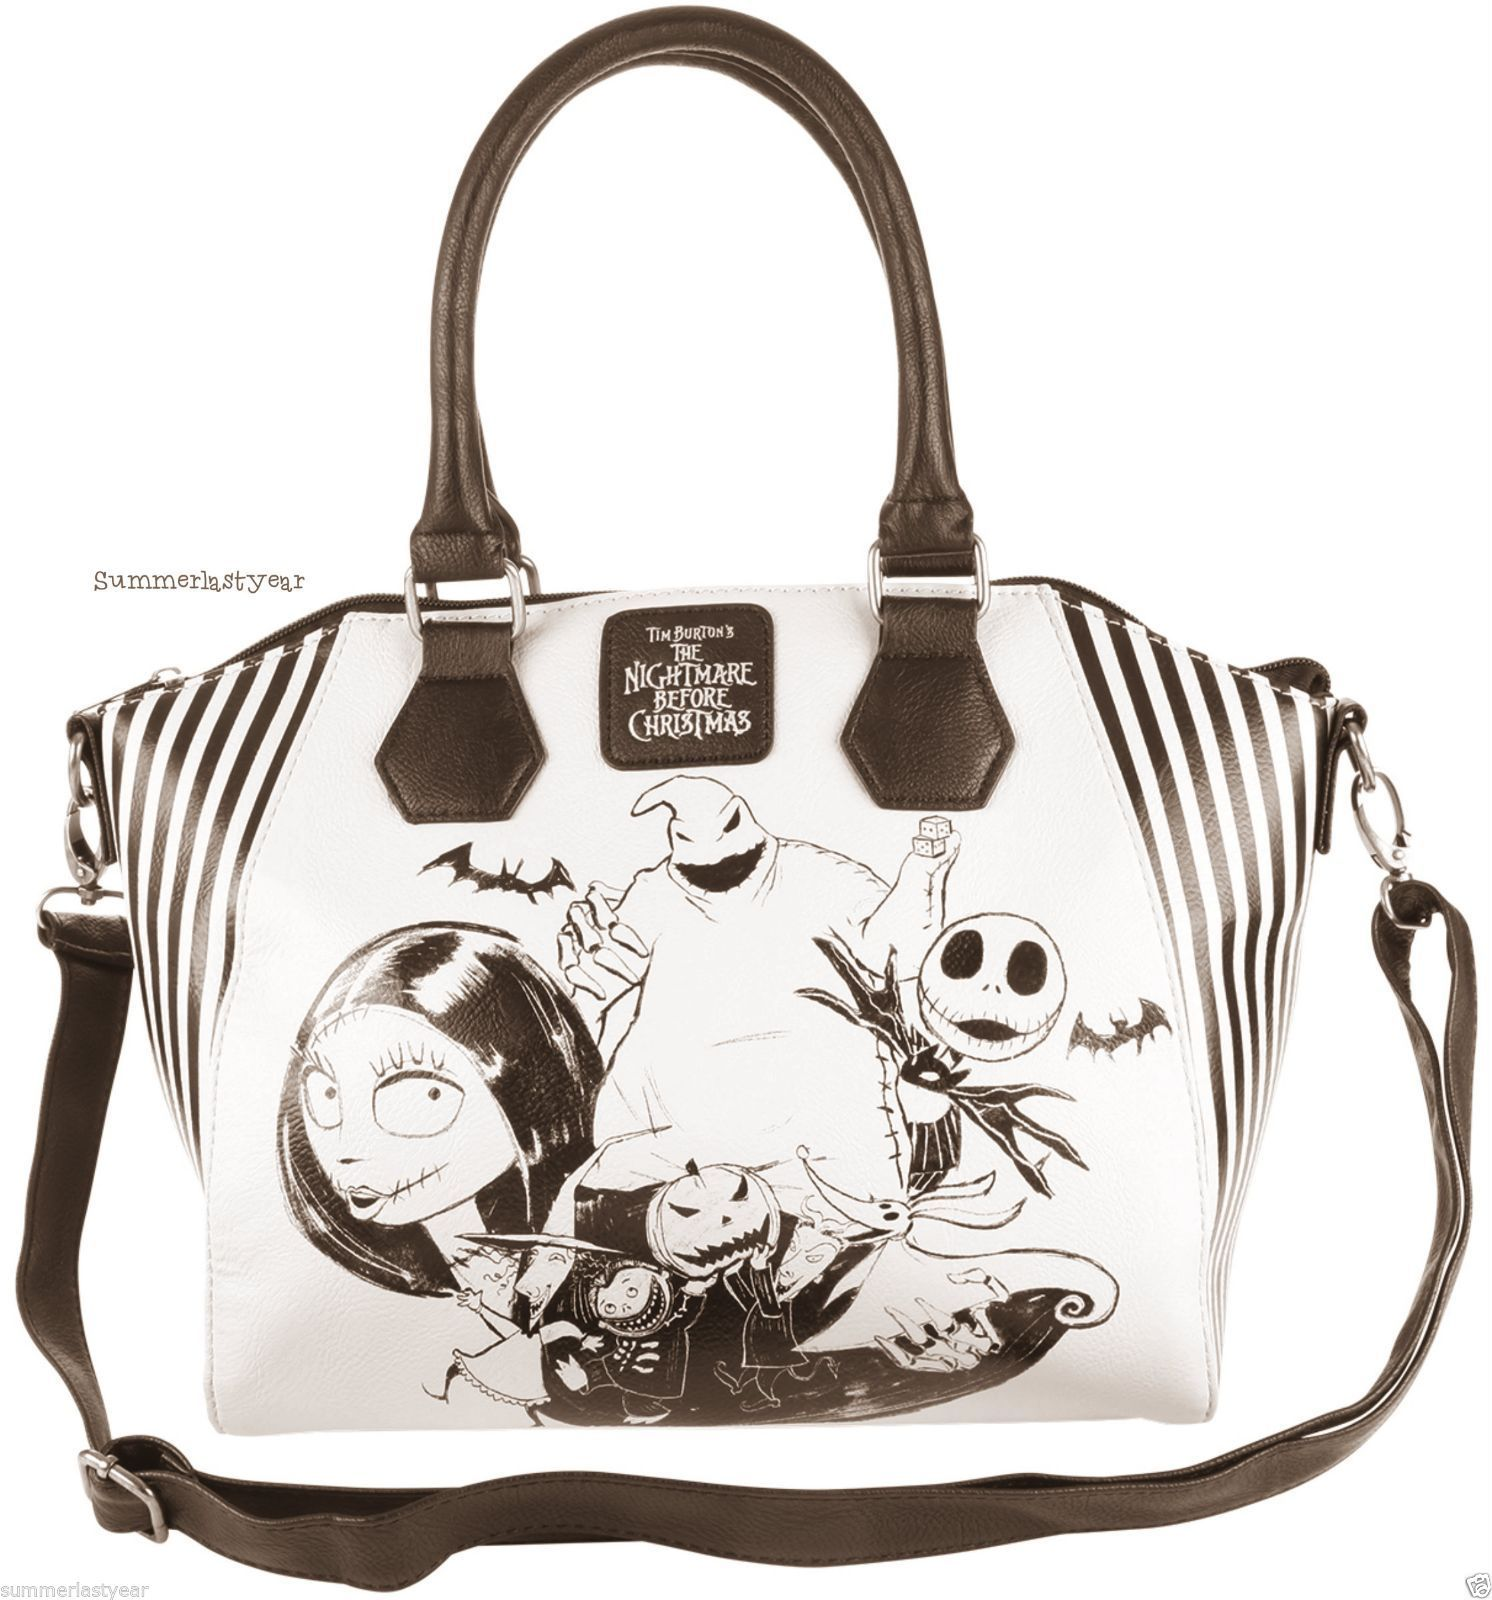 the nightmare before christmas satchel purse hand bag shoulder bag free ship ebay nightmare before - Christmas Purses Handbags